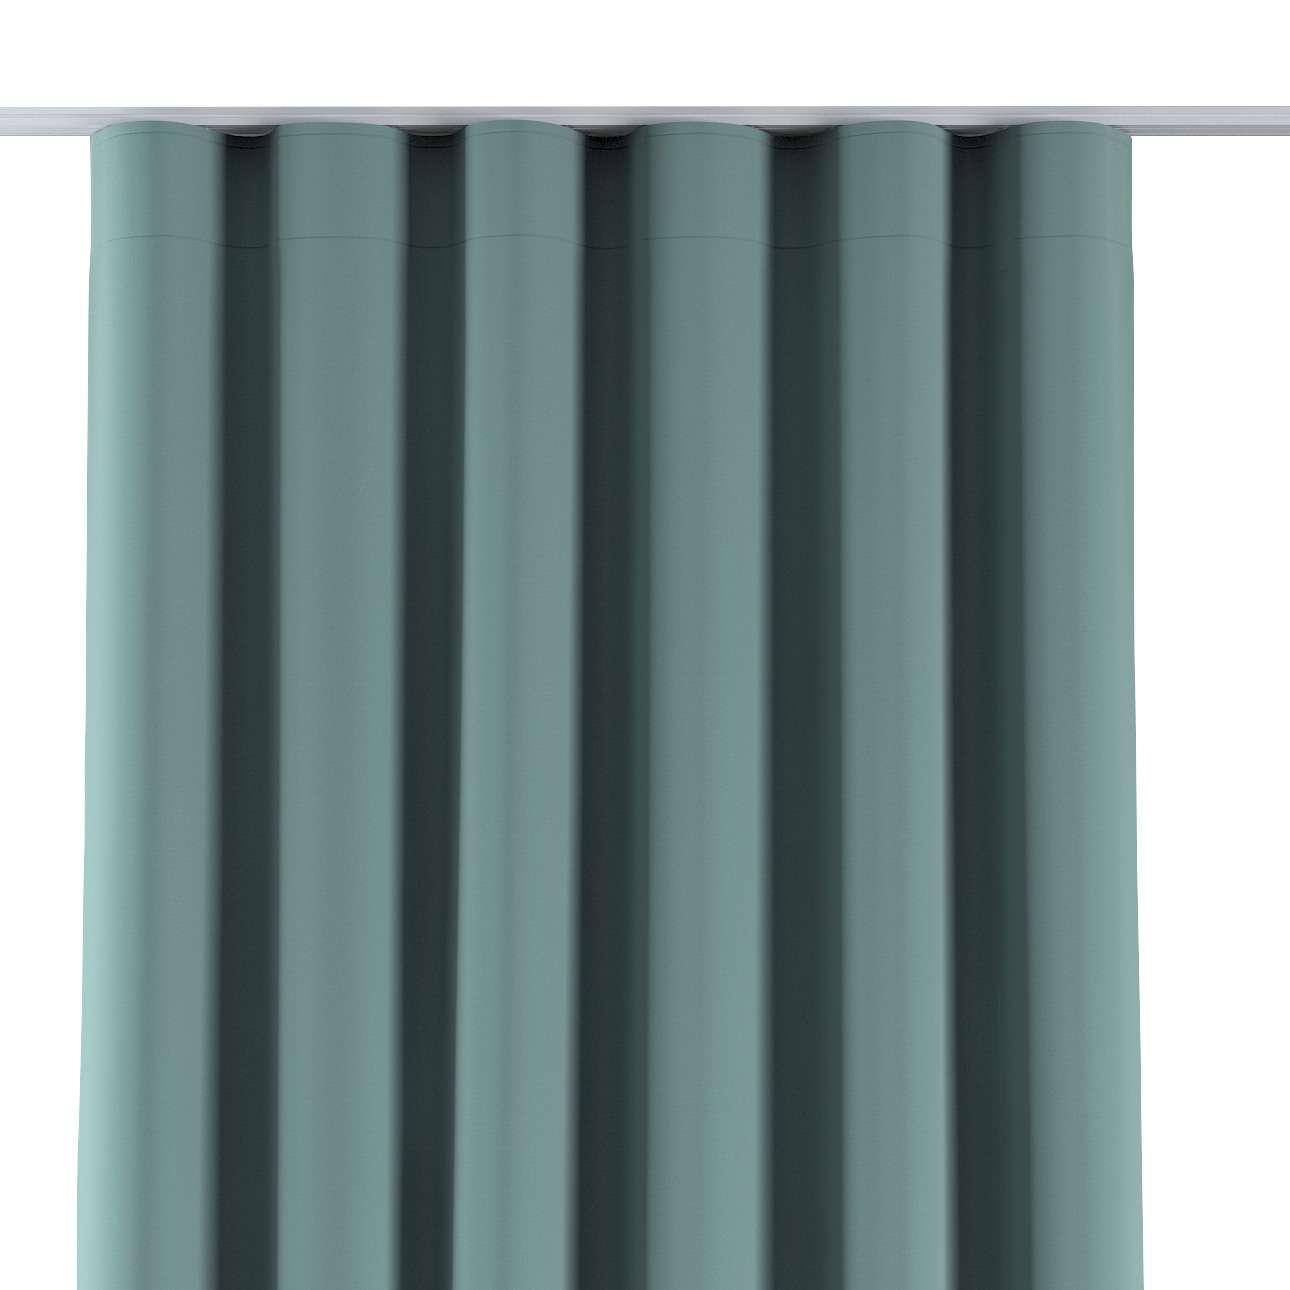 Zaves s riasením WAVE V kolekcii Velvet, tkanina: 704-18